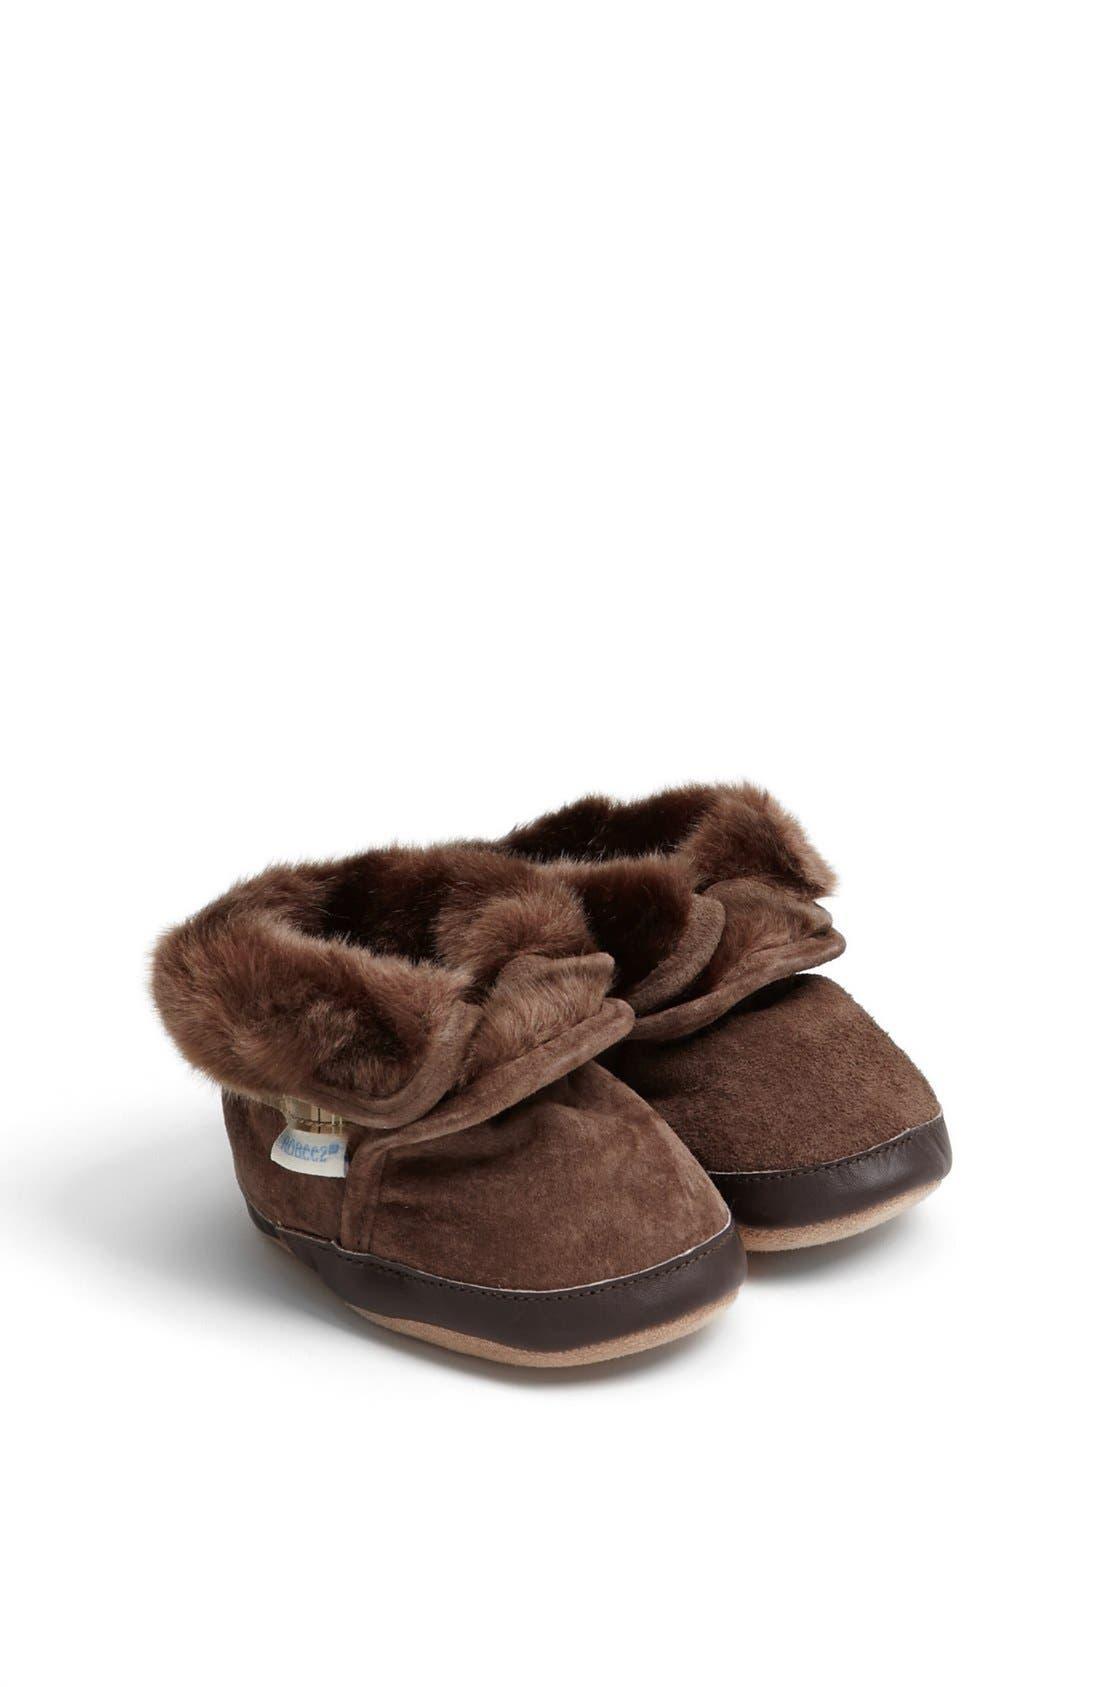 ROBEEZ® 'Cozy' Ankle Bootie